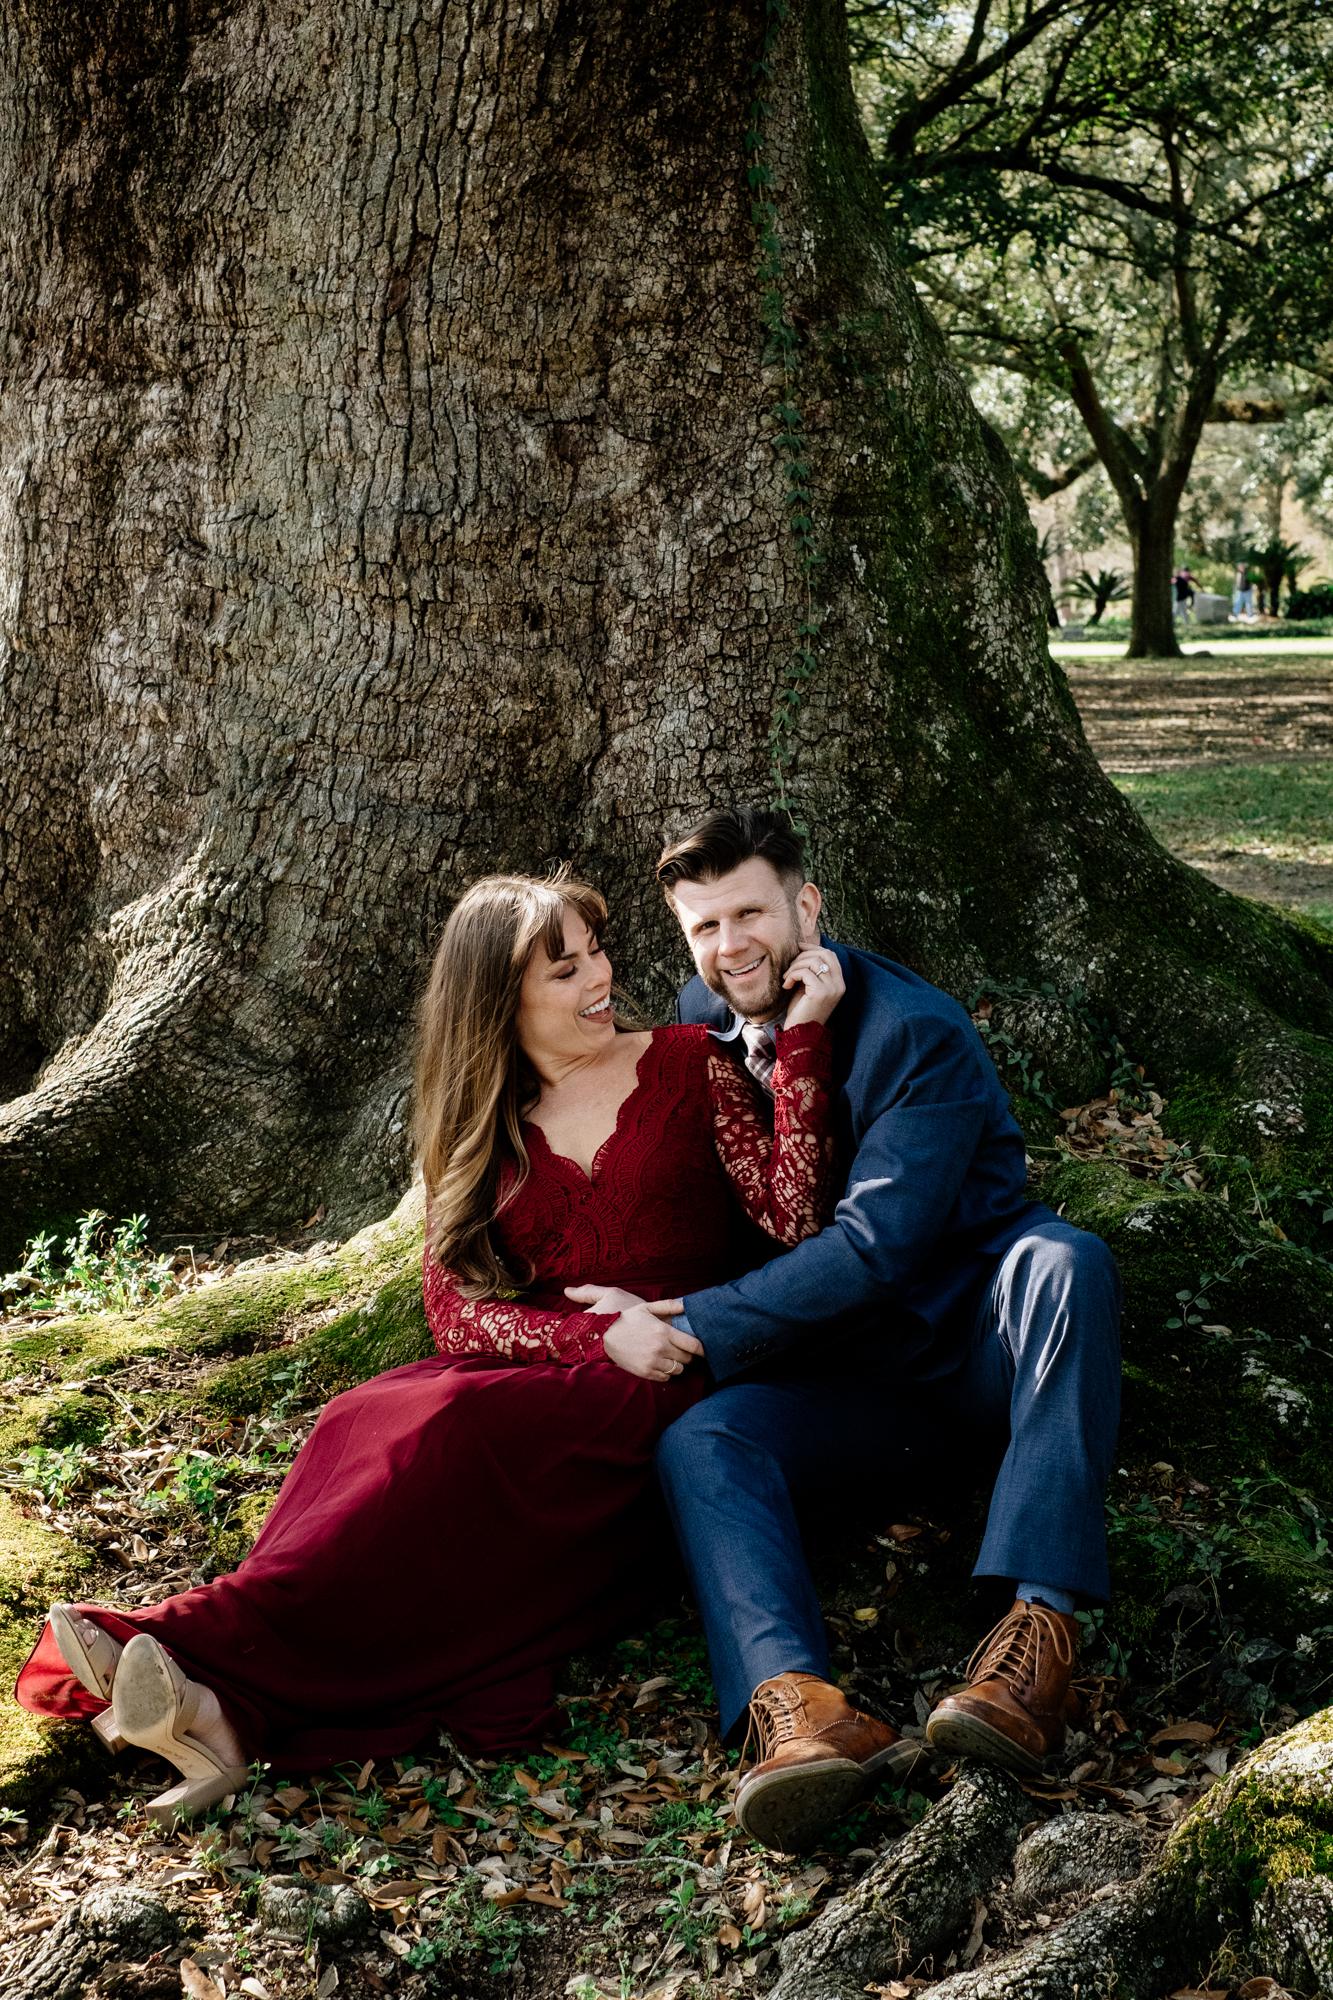 Jen_Montgomery_Photography_Angela_Brian_Engagement_Proposal_FB-152.jpg